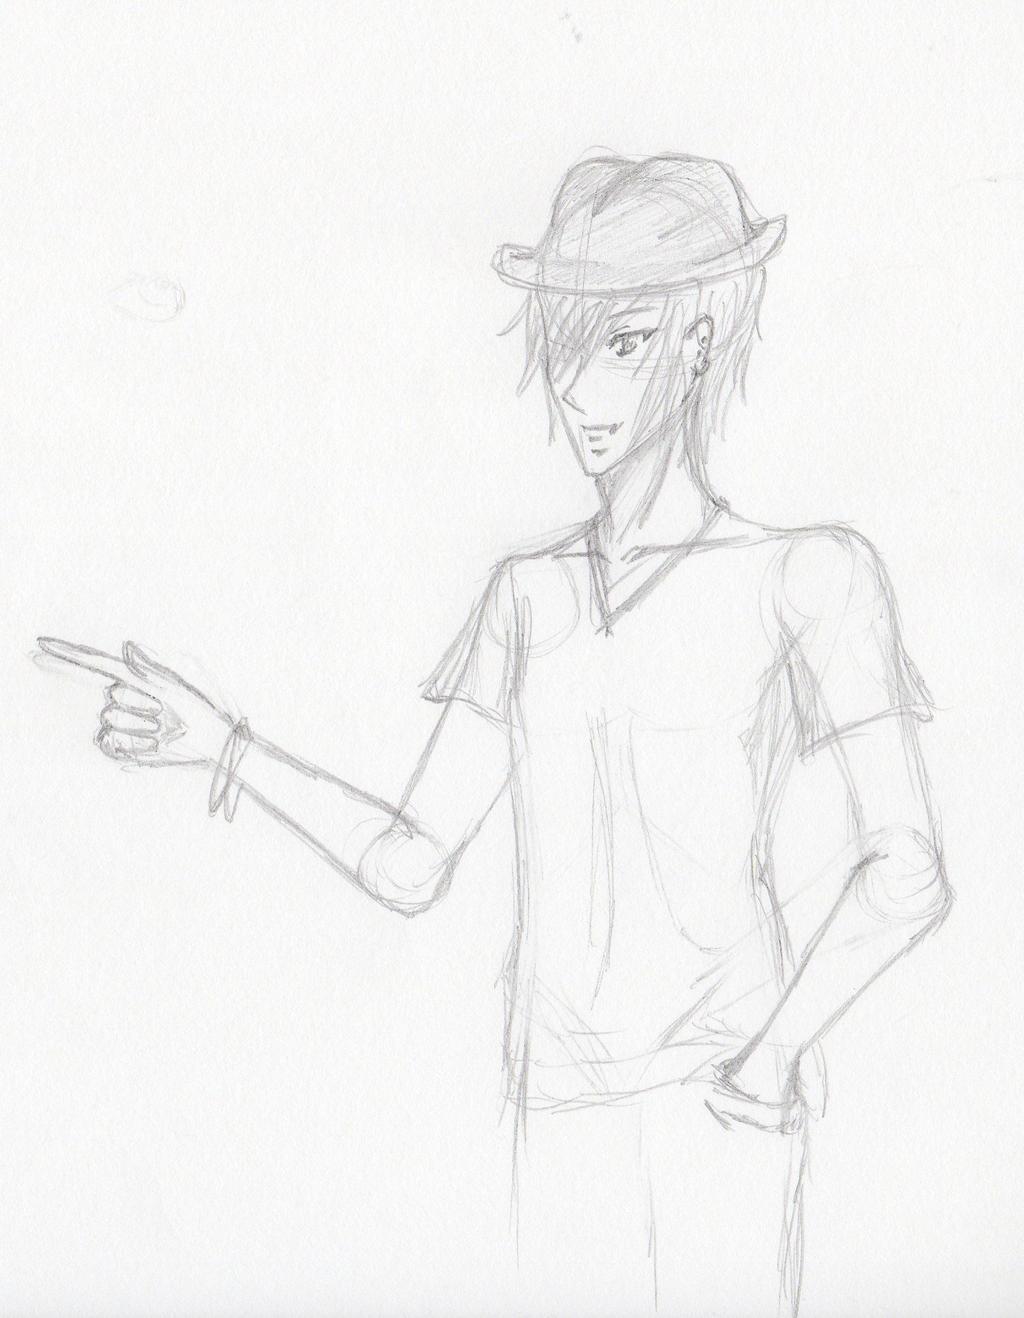 Cool Boy Sketch By Futsunotenshinai On Deviantart